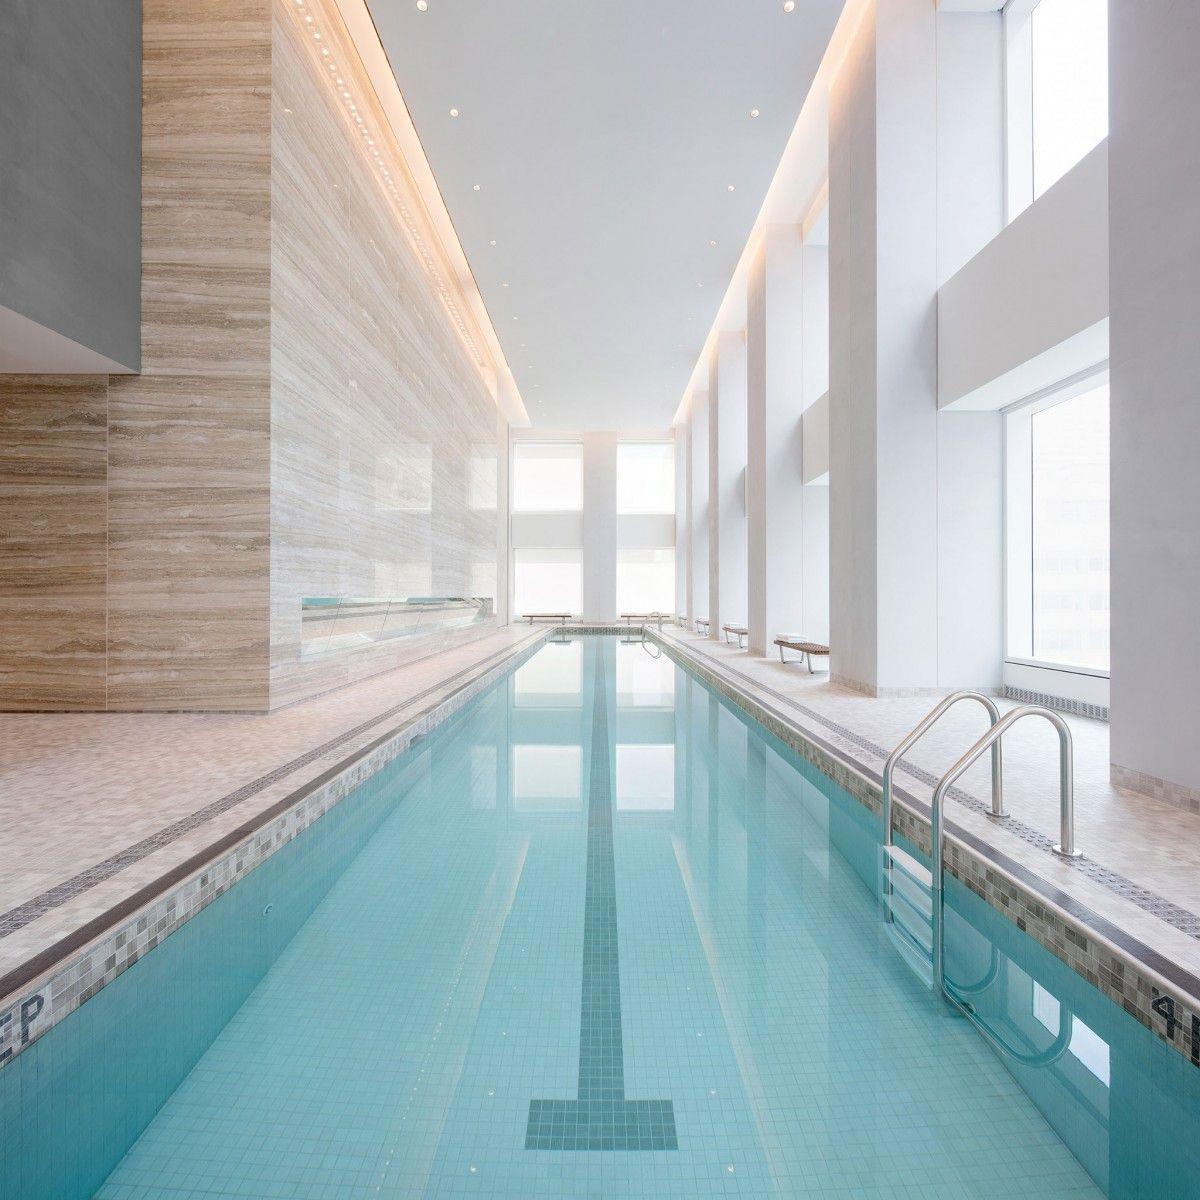 New Images Reveal 432 Park Avenue S Luxury Amenity Spaces 432 Park Avenue Nyc Condo Luxury Pools